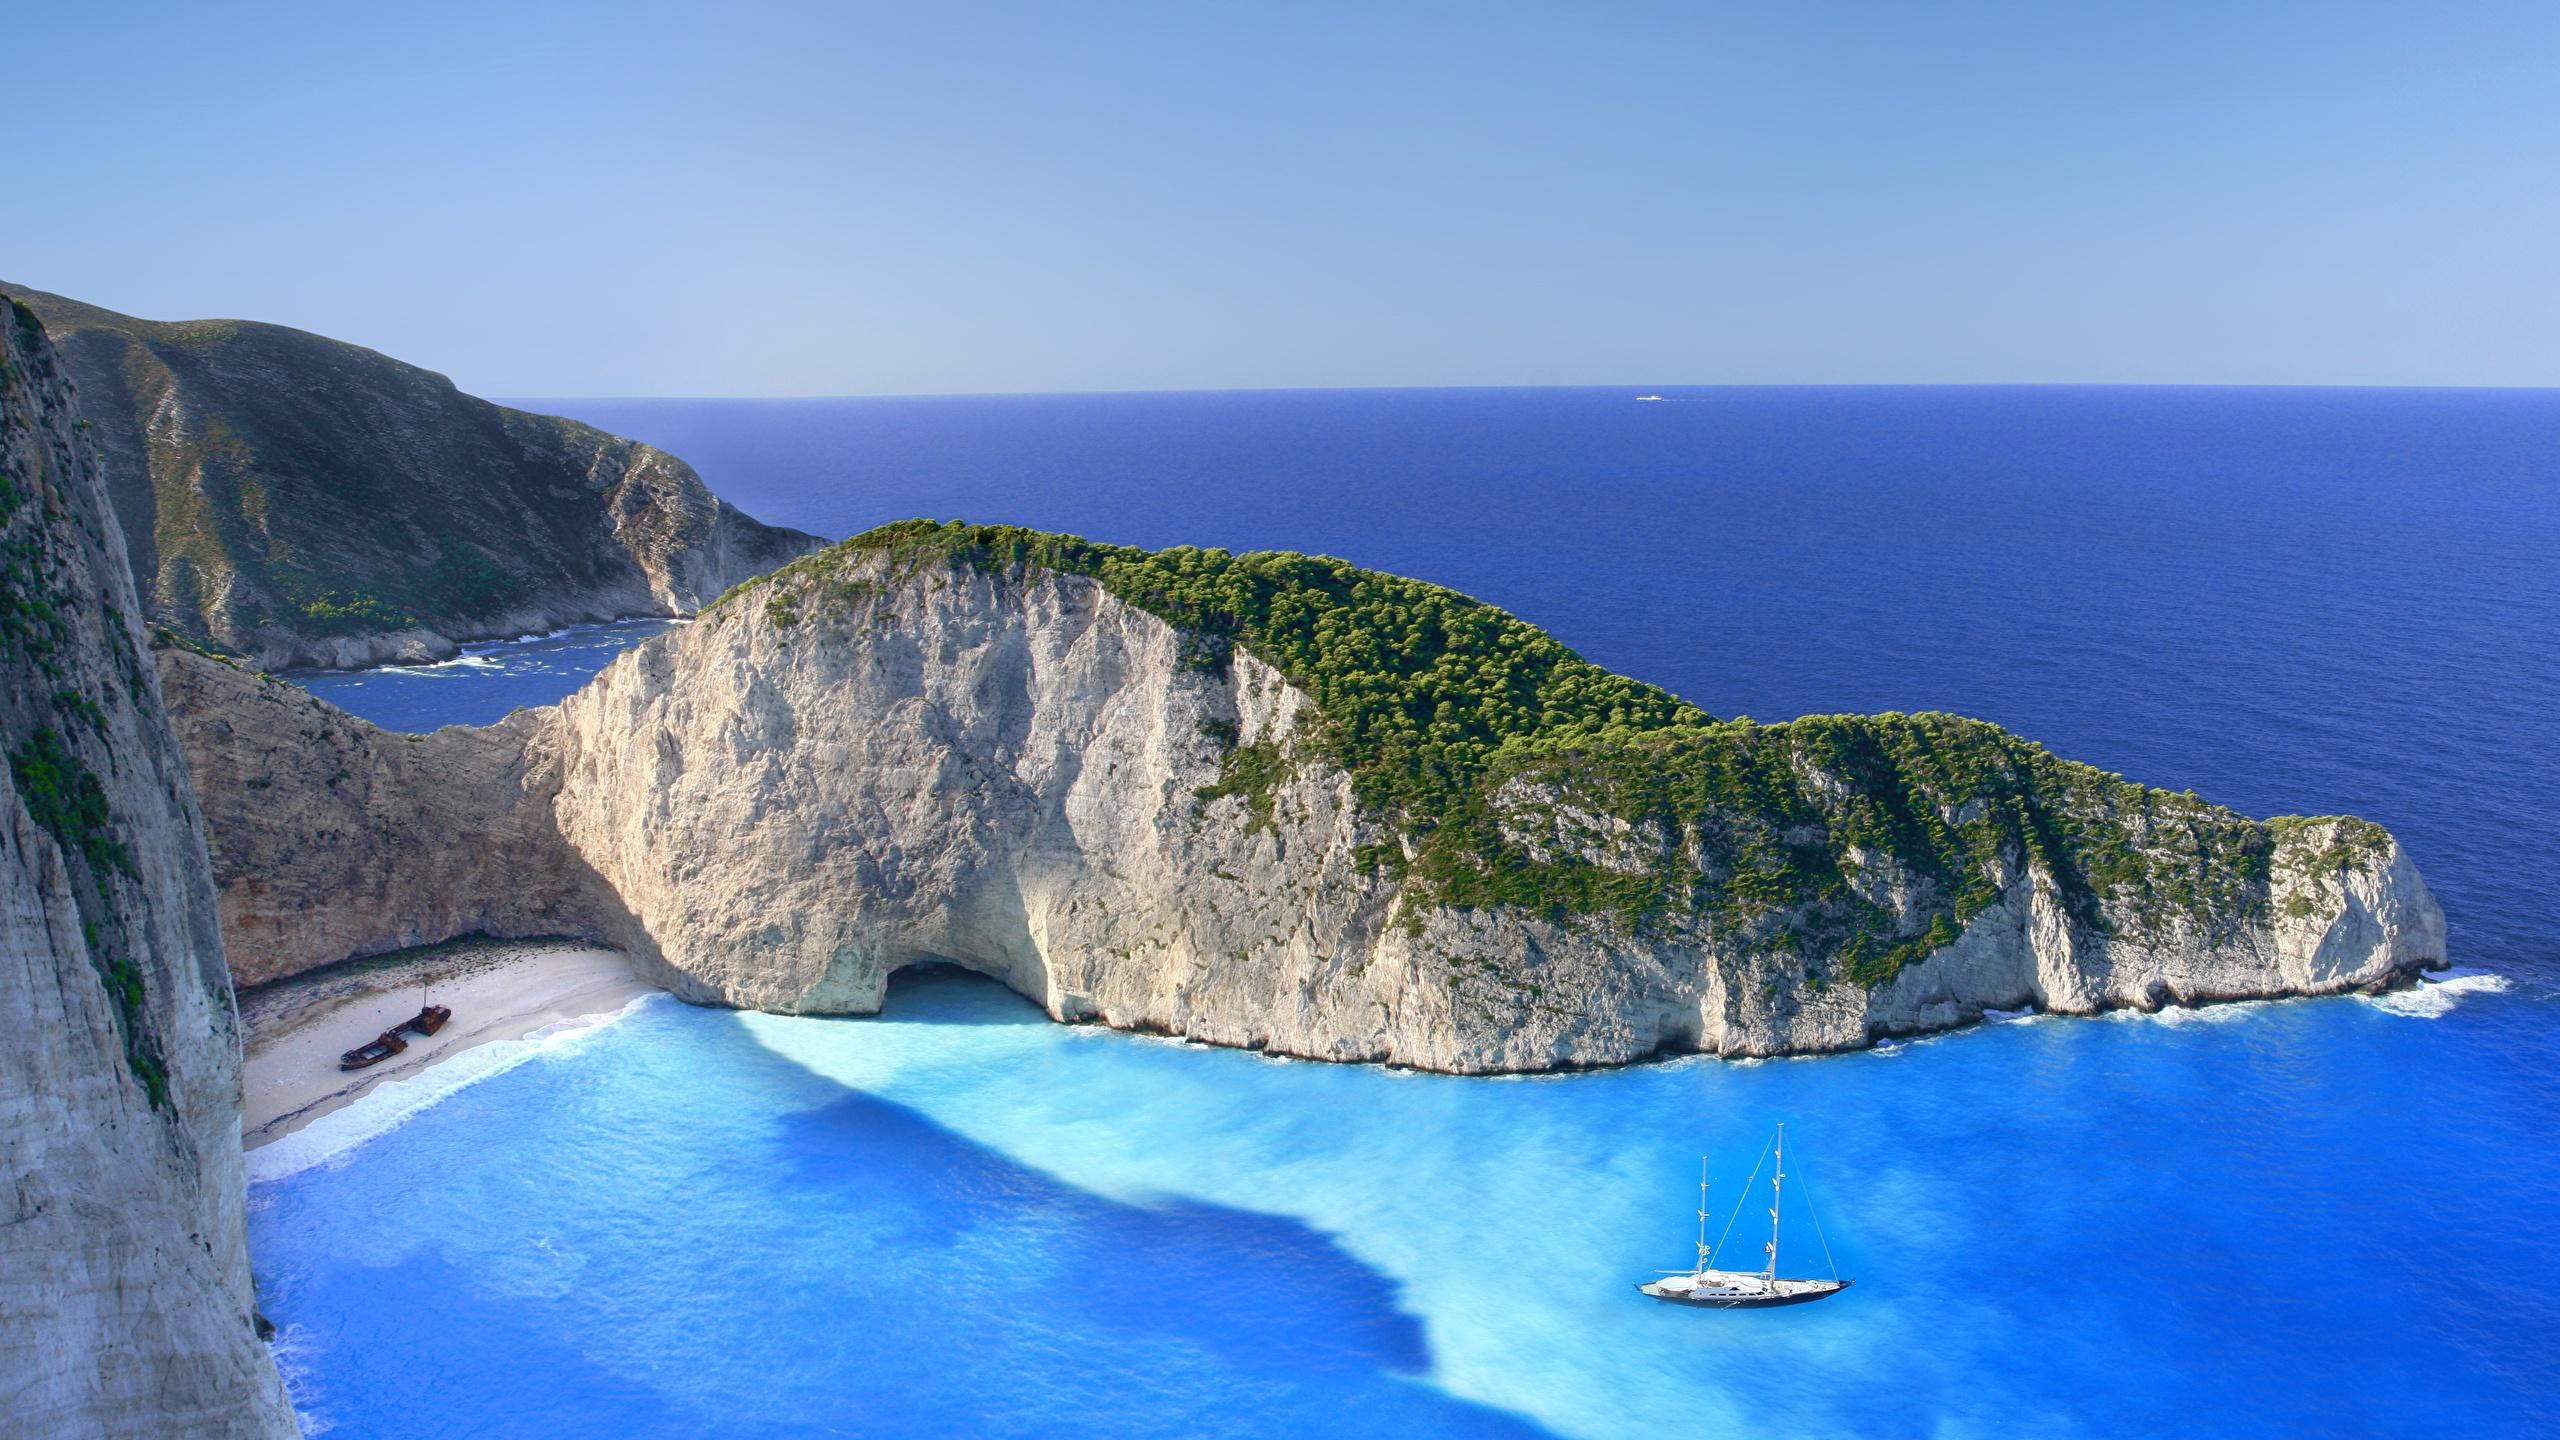 Images Greece Zakynthos Navagio Sea Crag Nature Cove 2560x1440 2560x1440